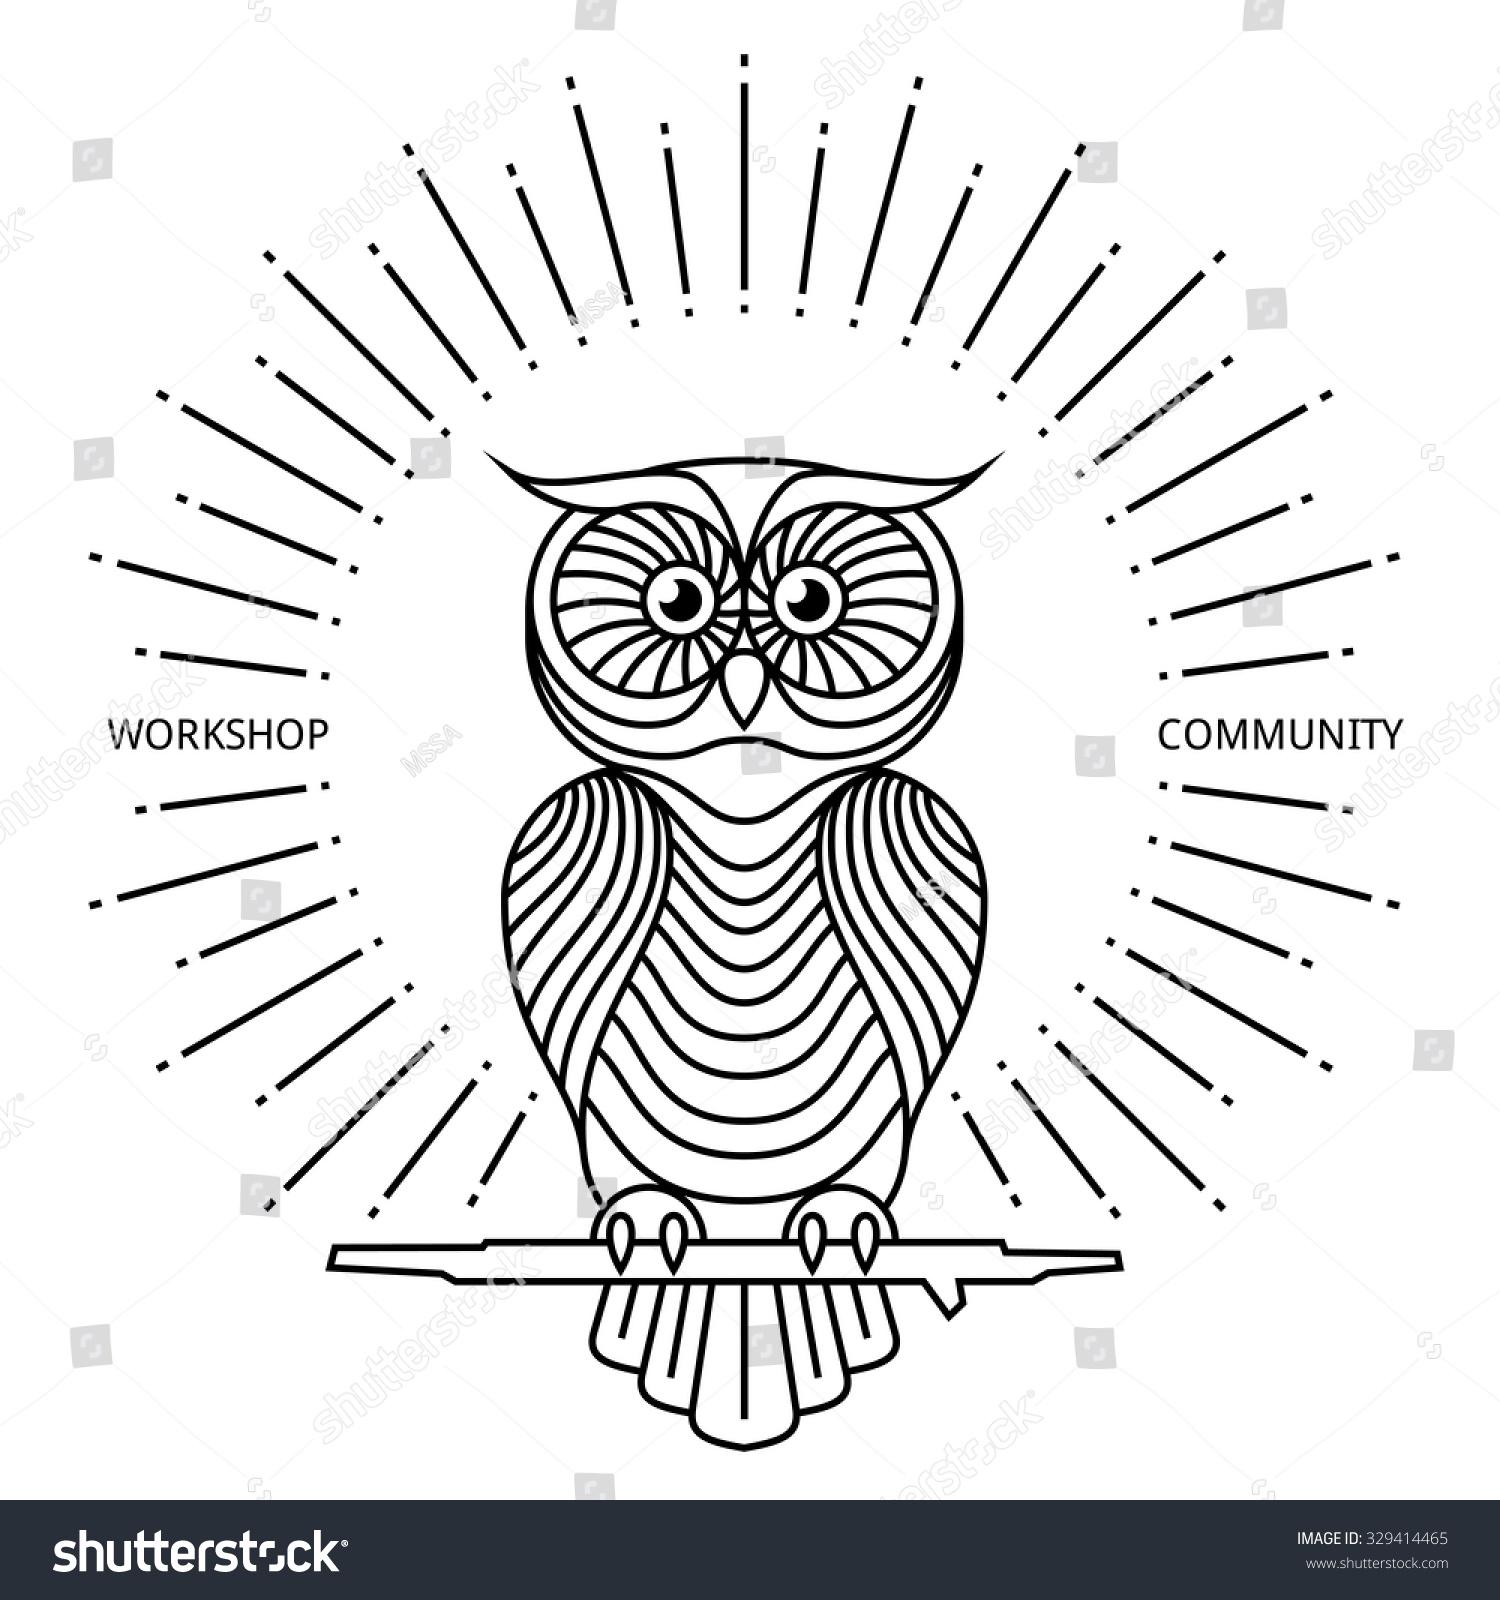 Opinion you vintage owl art